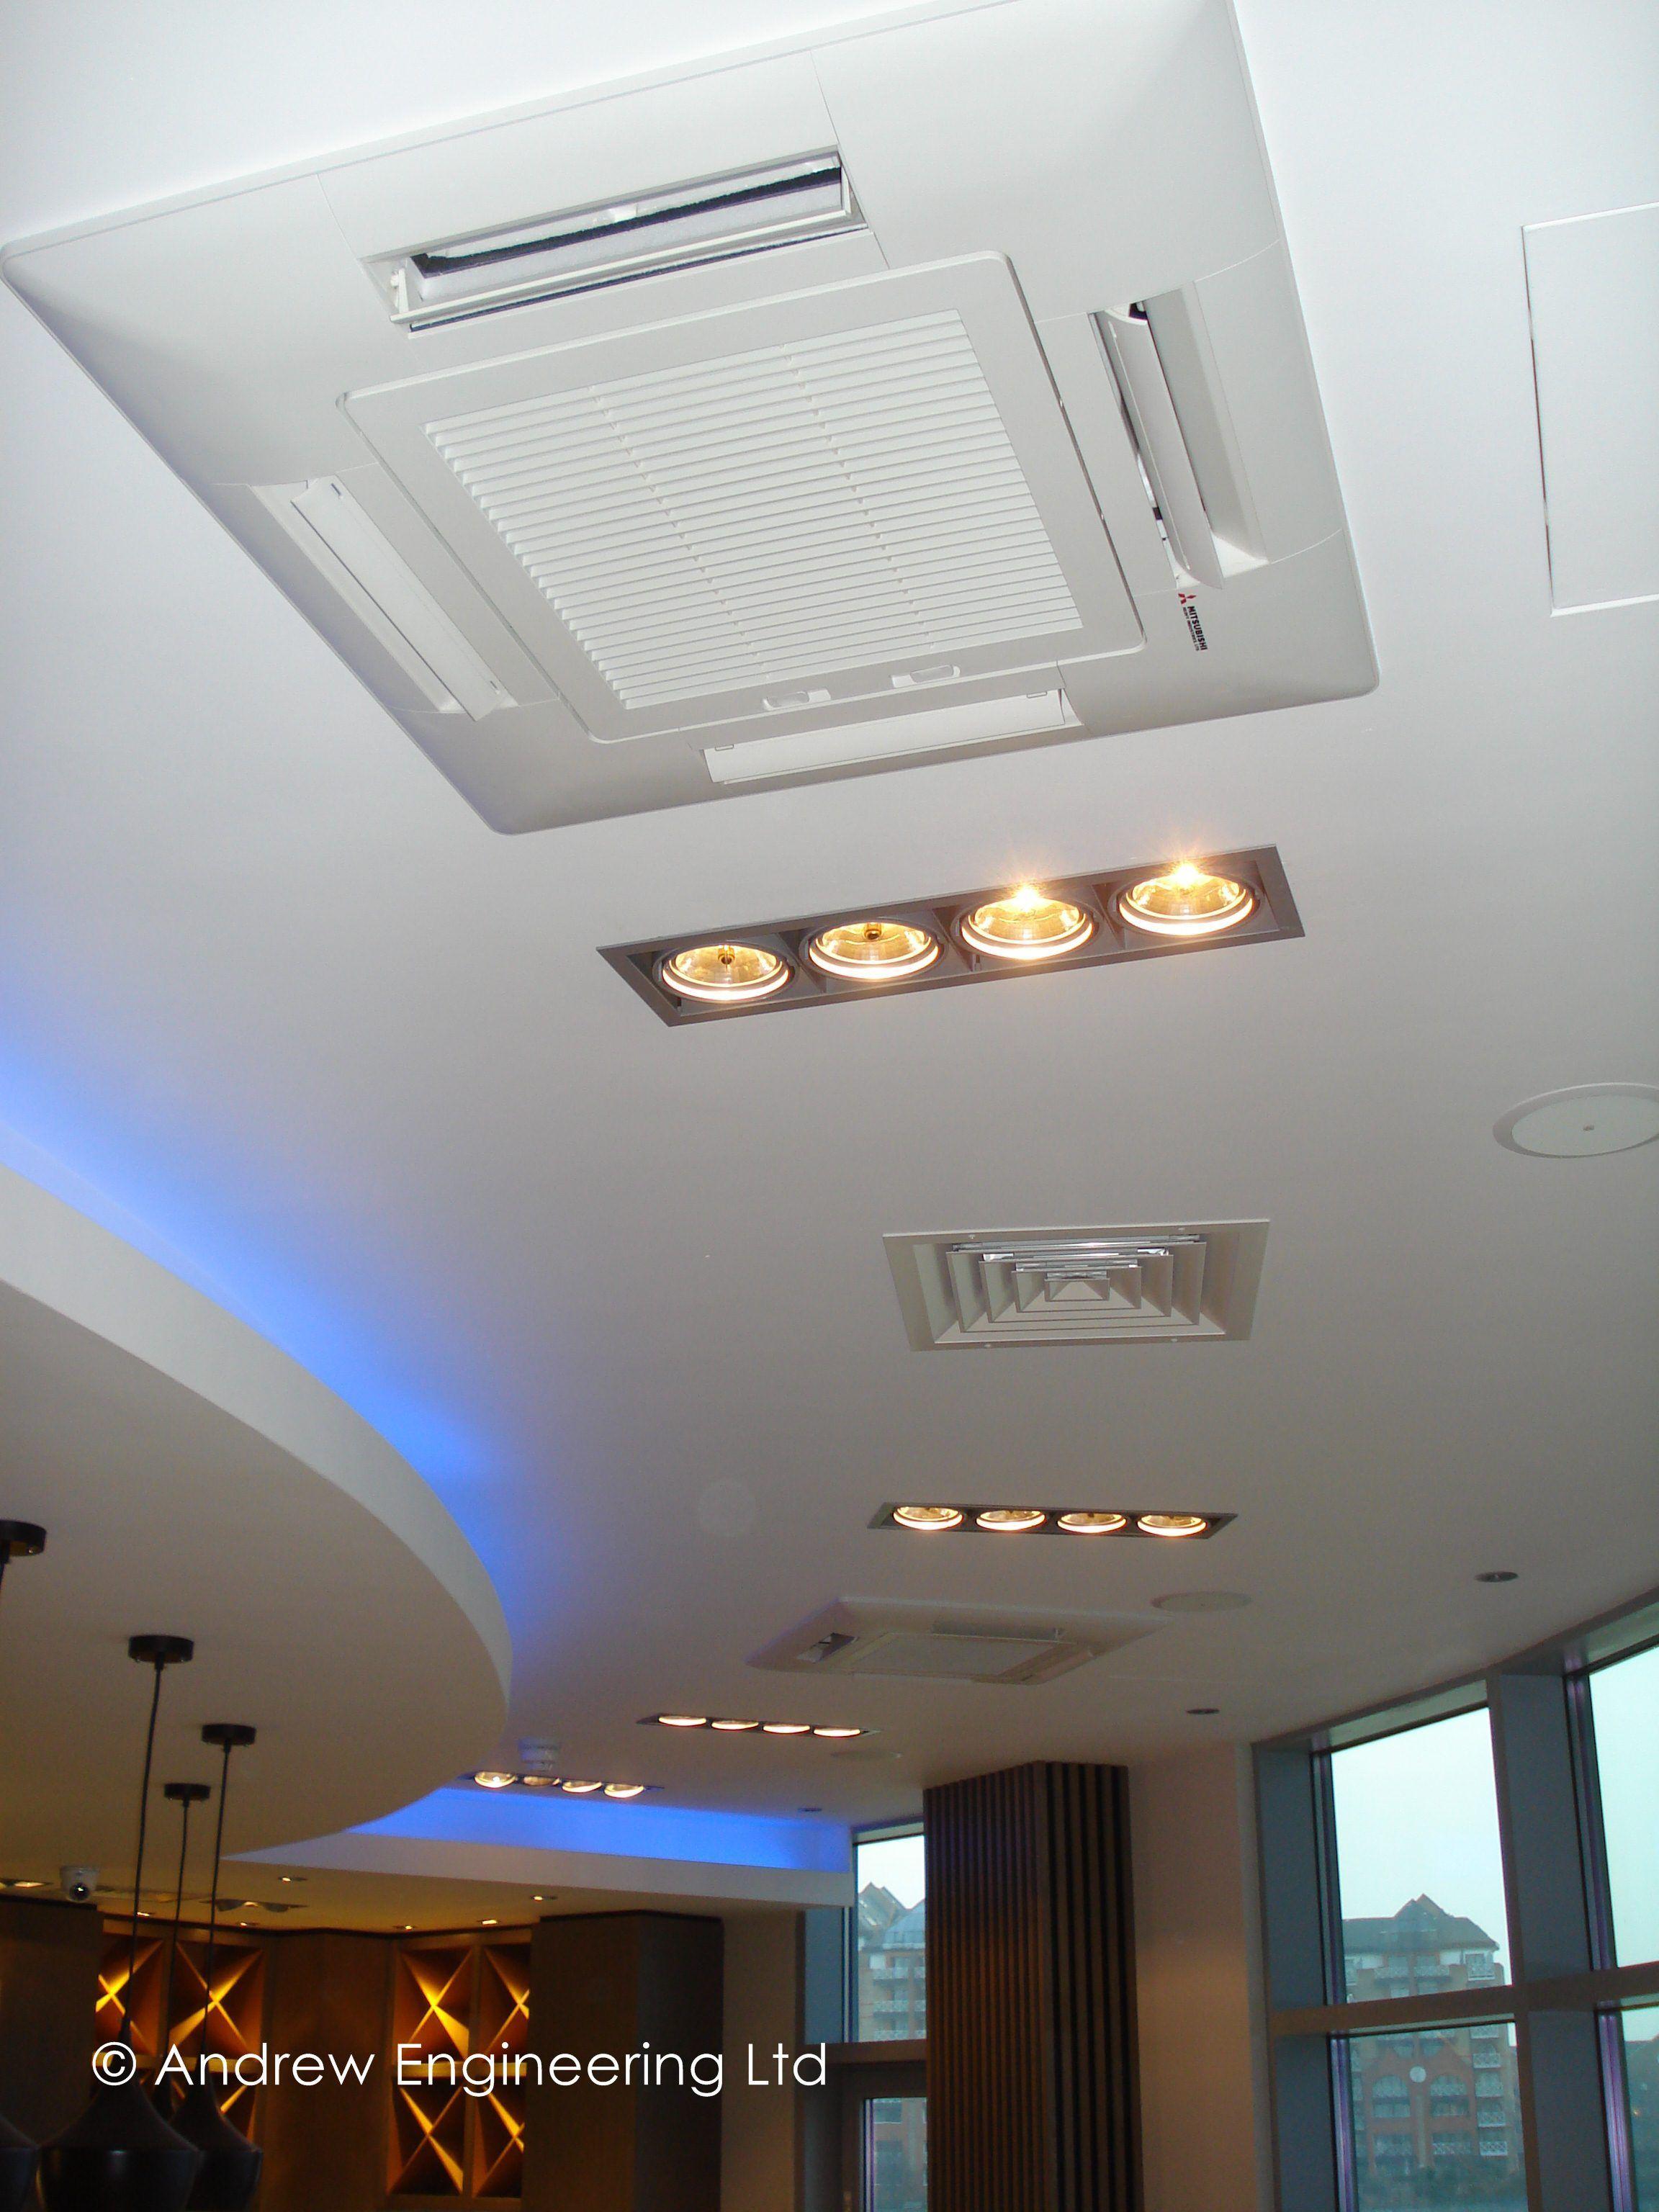 Modern Cassette Ac Ceiling Design Ceiling design, False